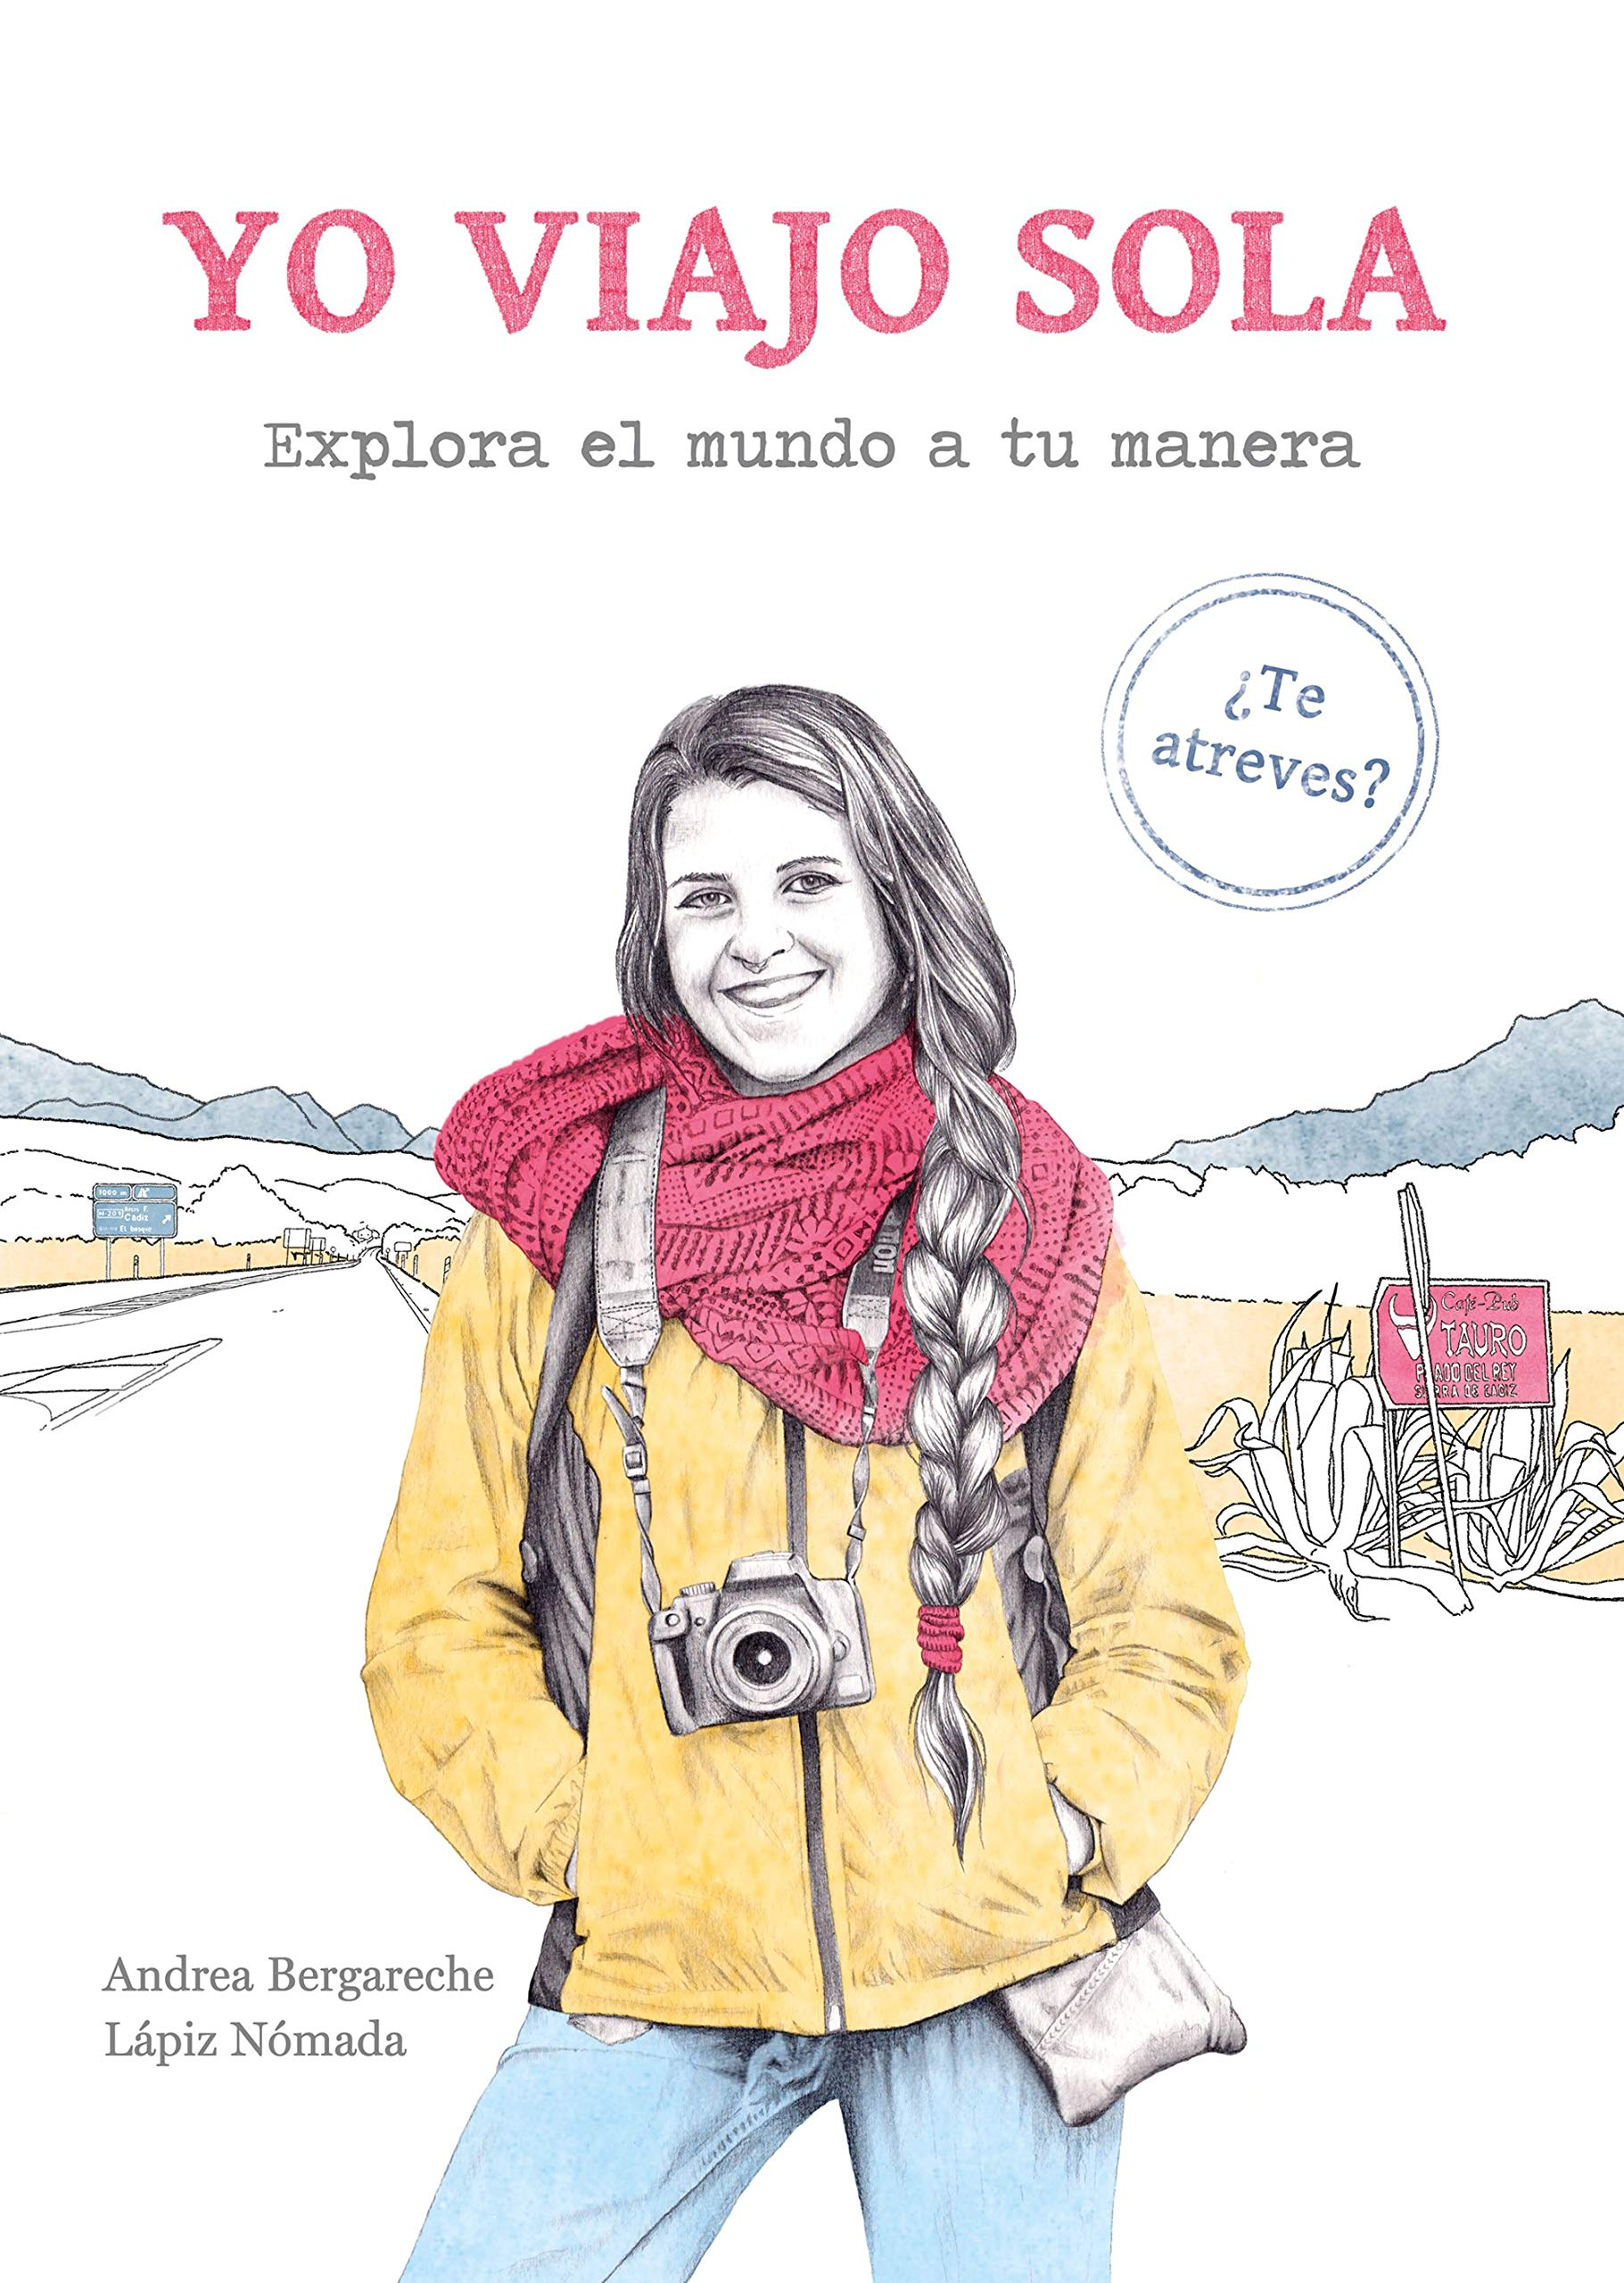 Yo viajo sola: Explora el mundo a tu manera. ¿Te atreves?